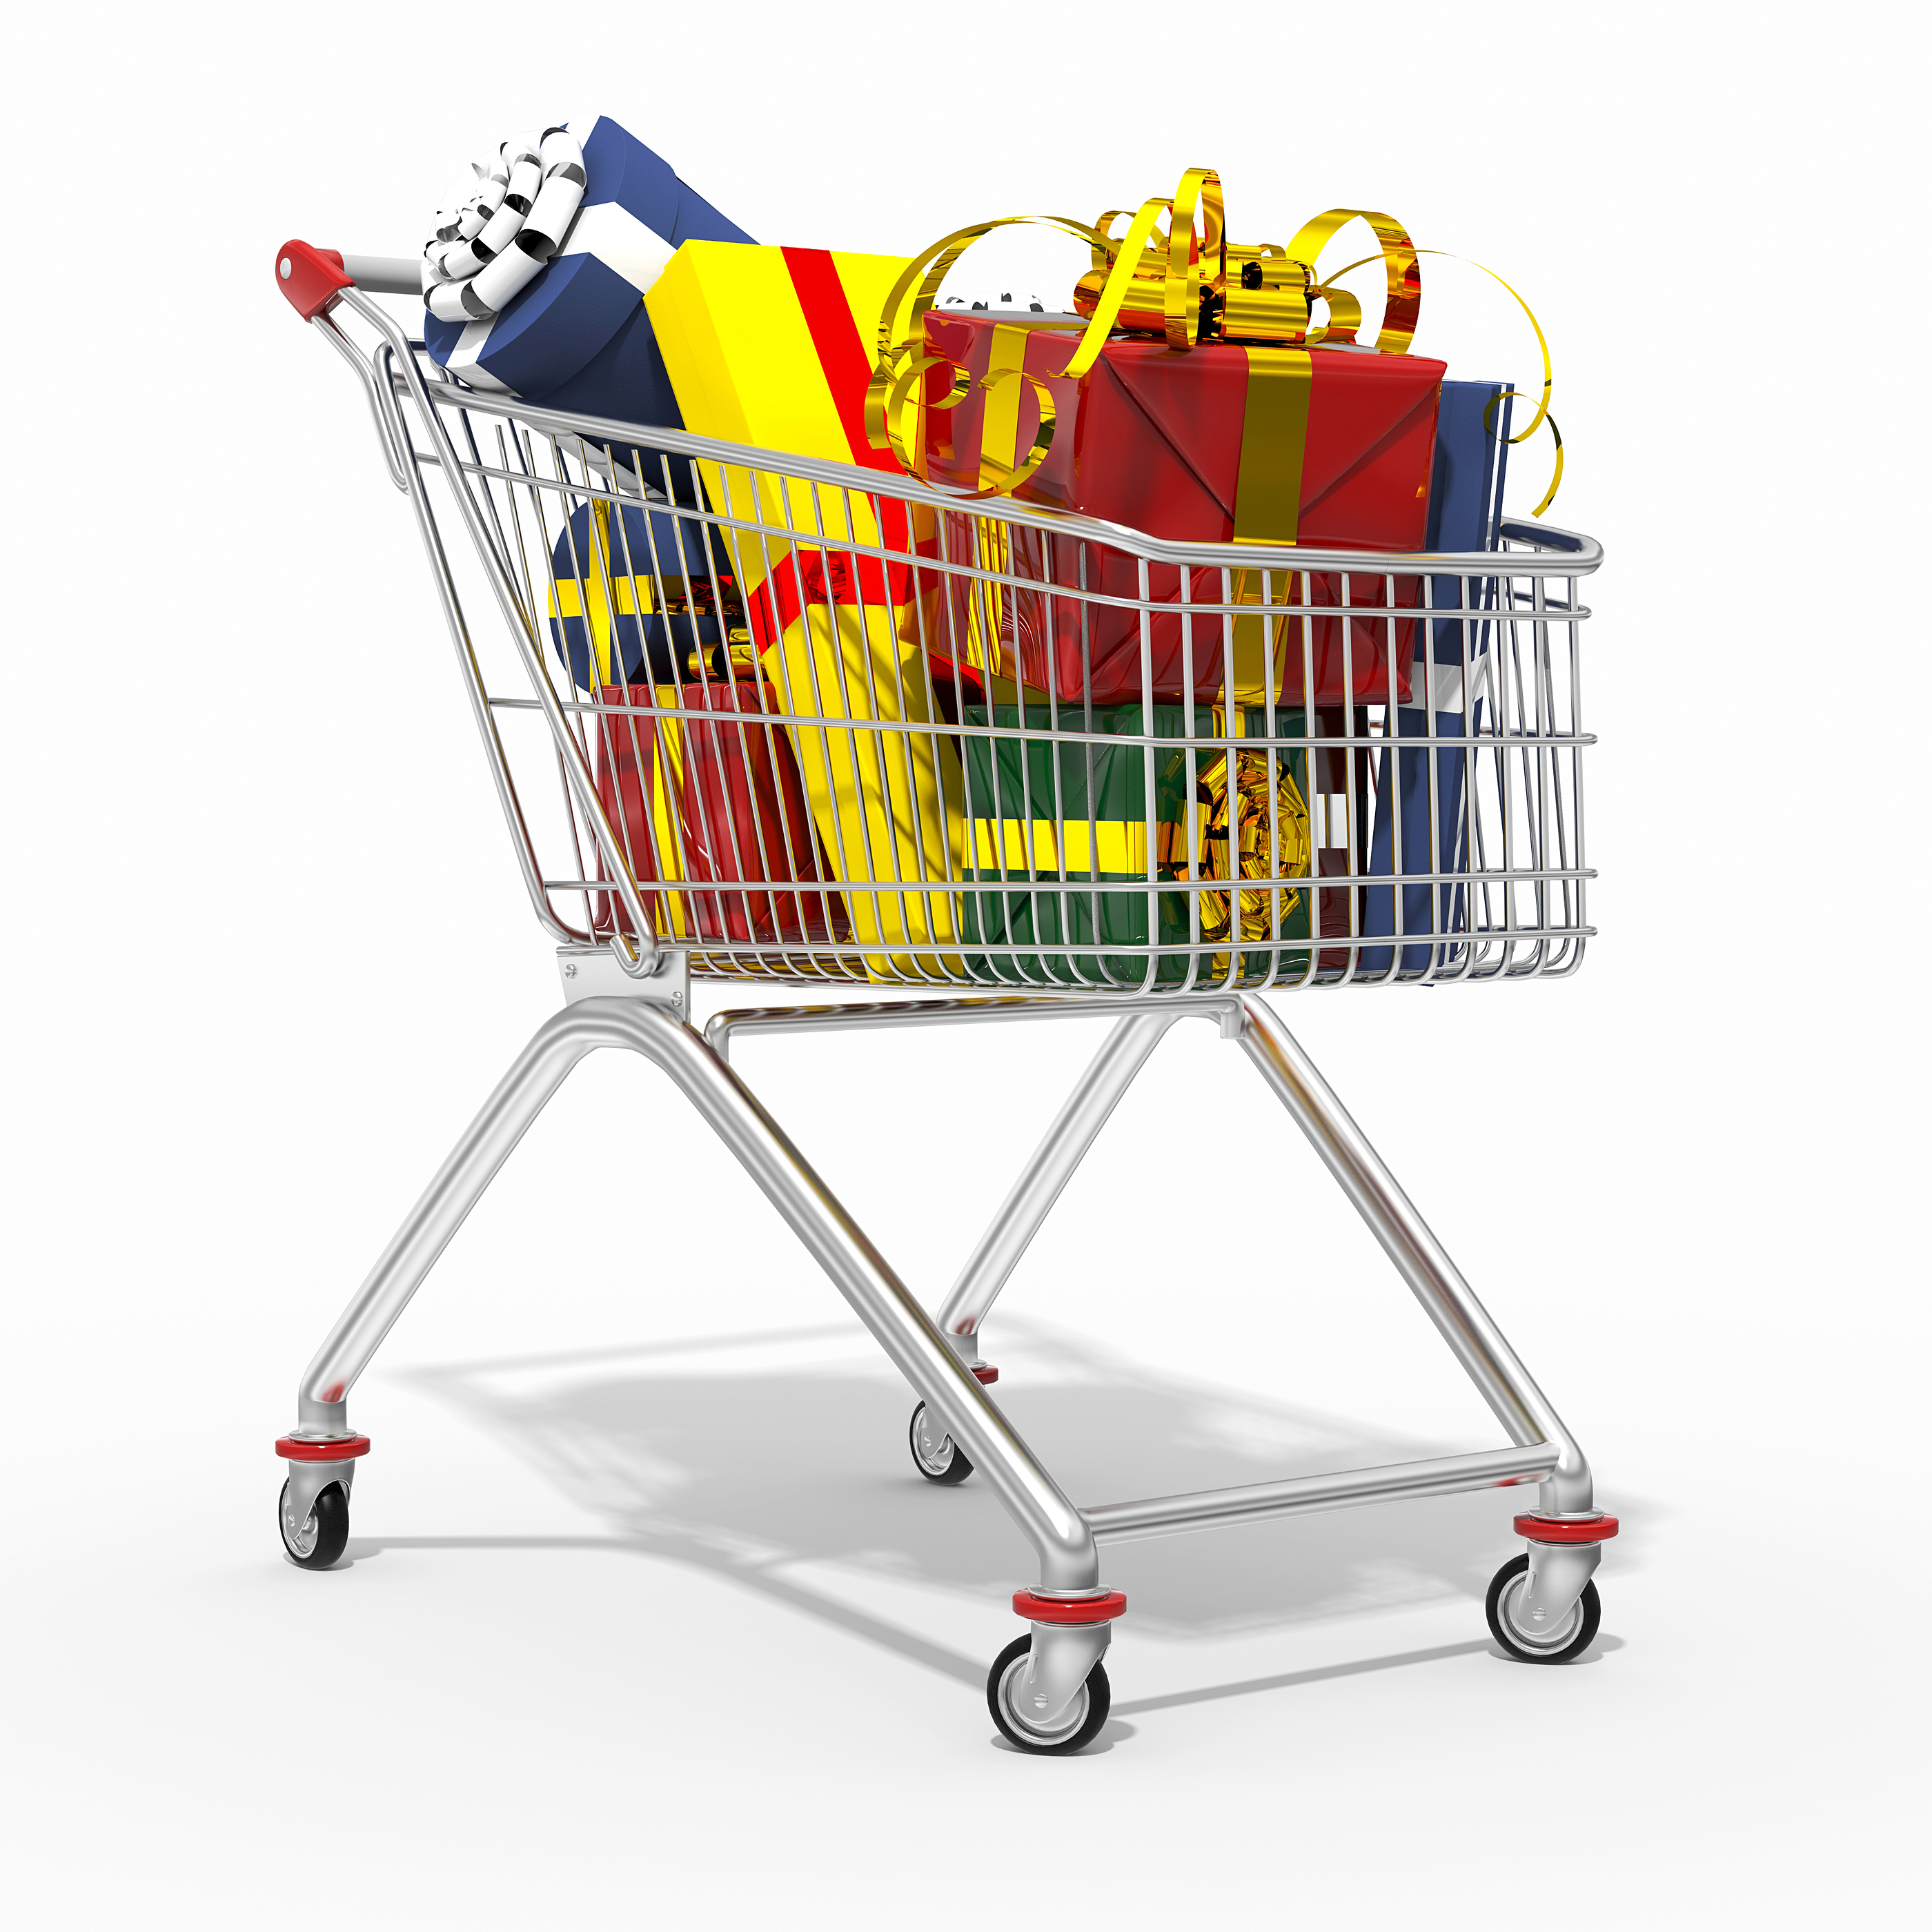 1424-Photorealistic-D-shopping-cart